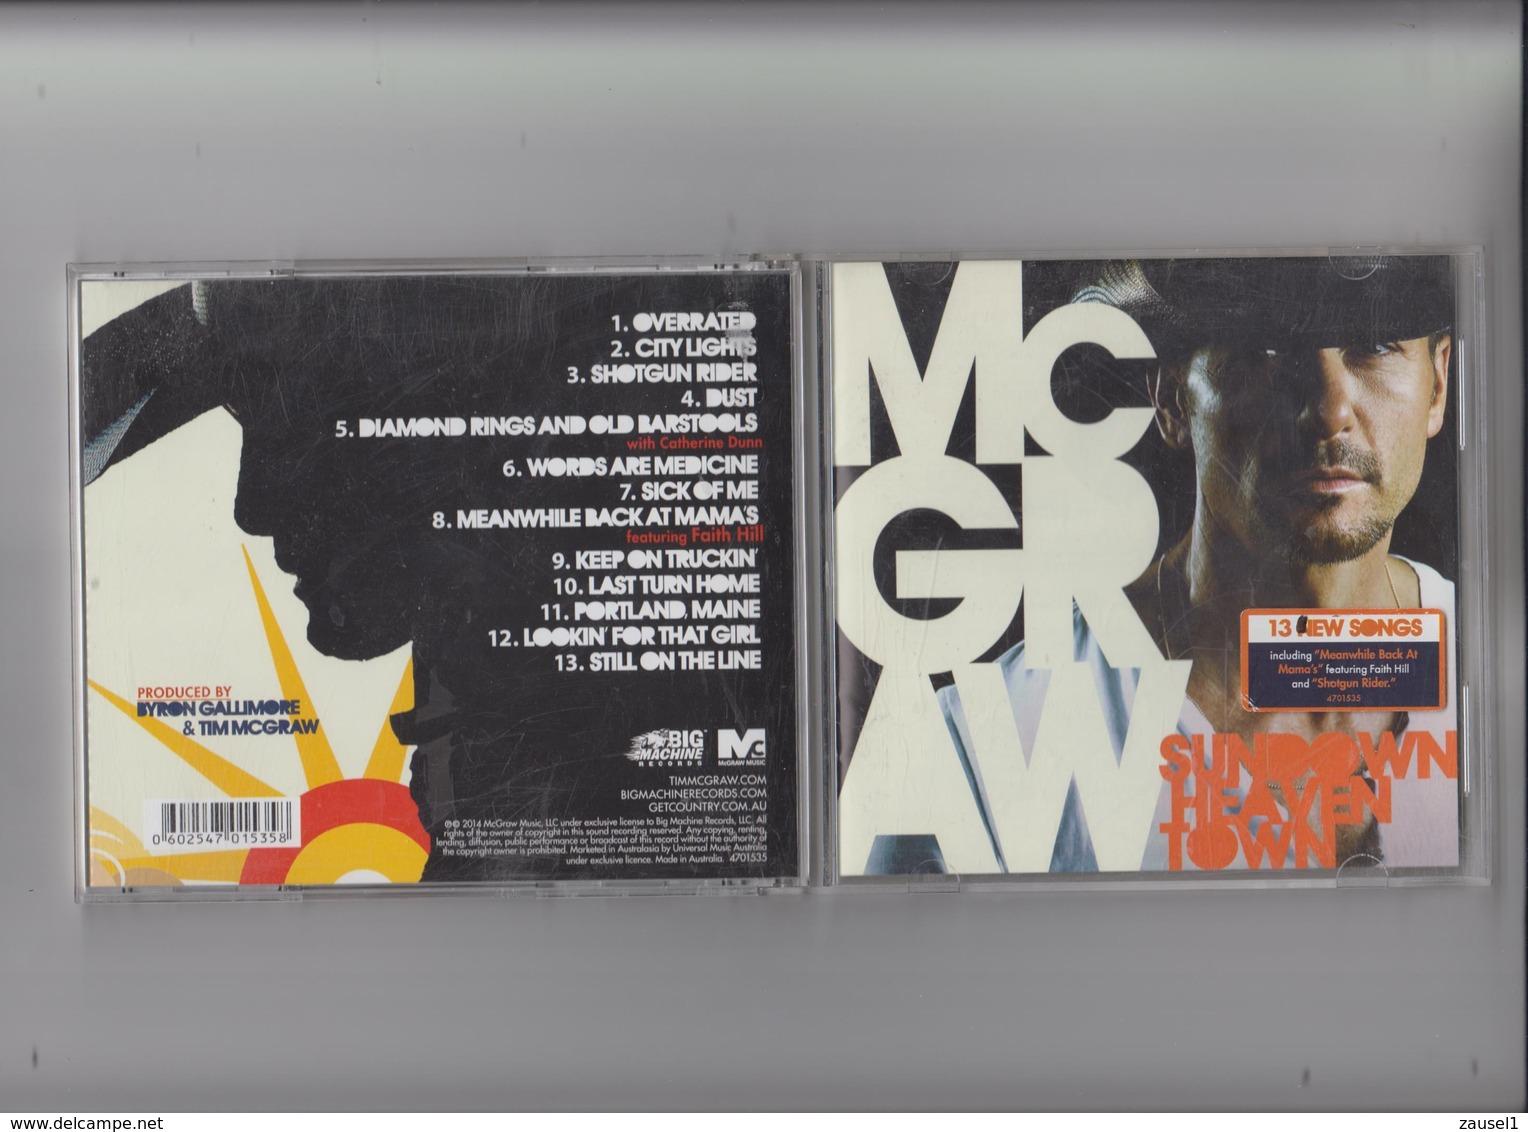 Tim McGraw - Sundown Heaven Town - Original CD - Country & Folk